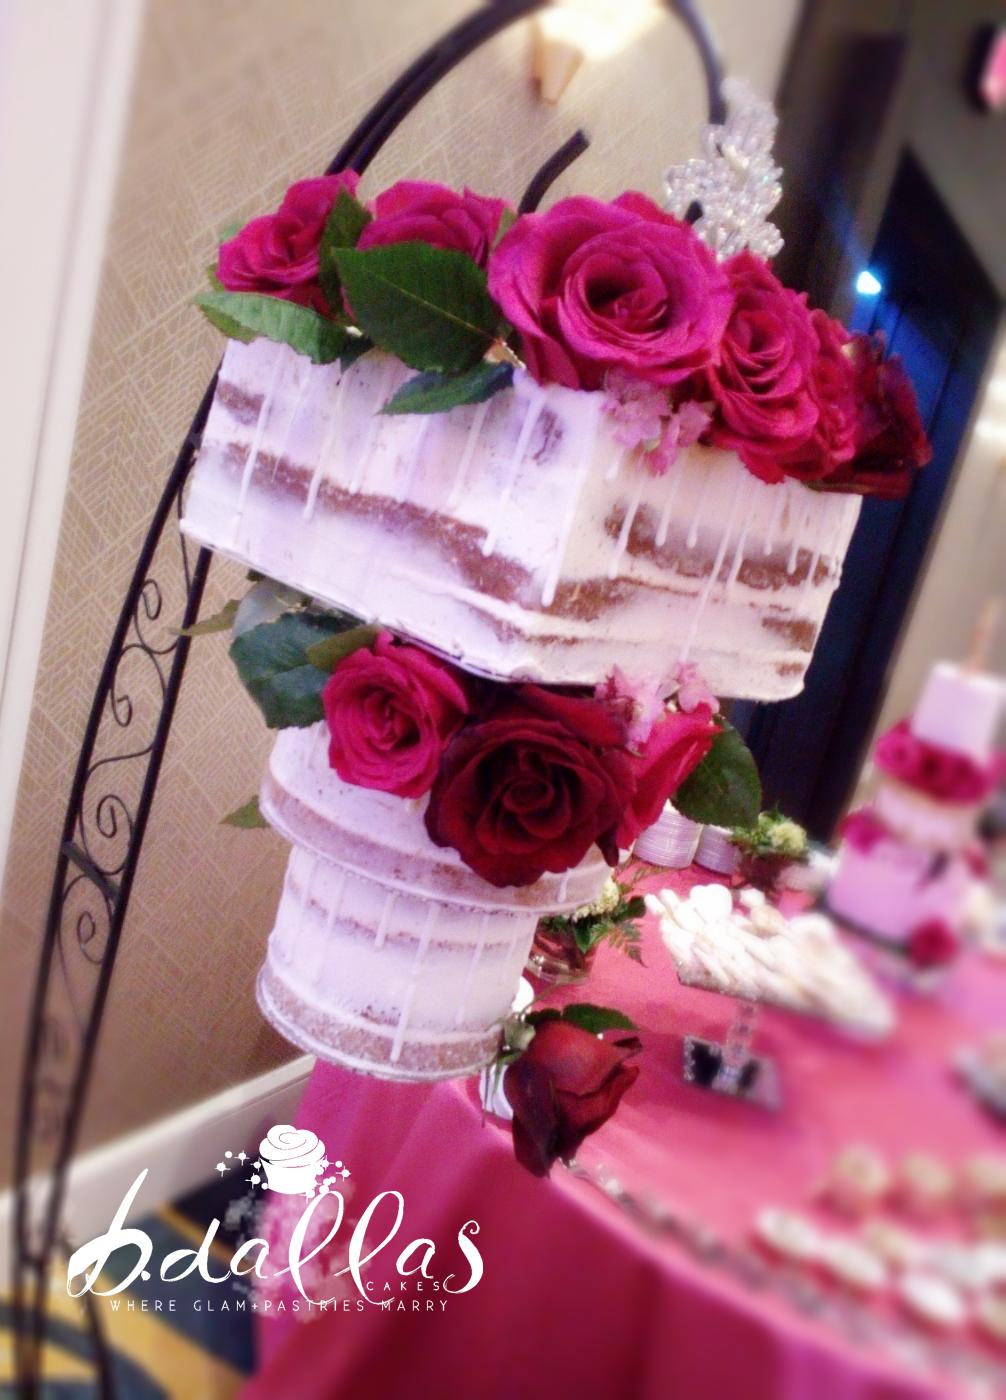 HANGING CHANDELIER WEDDING CAKE